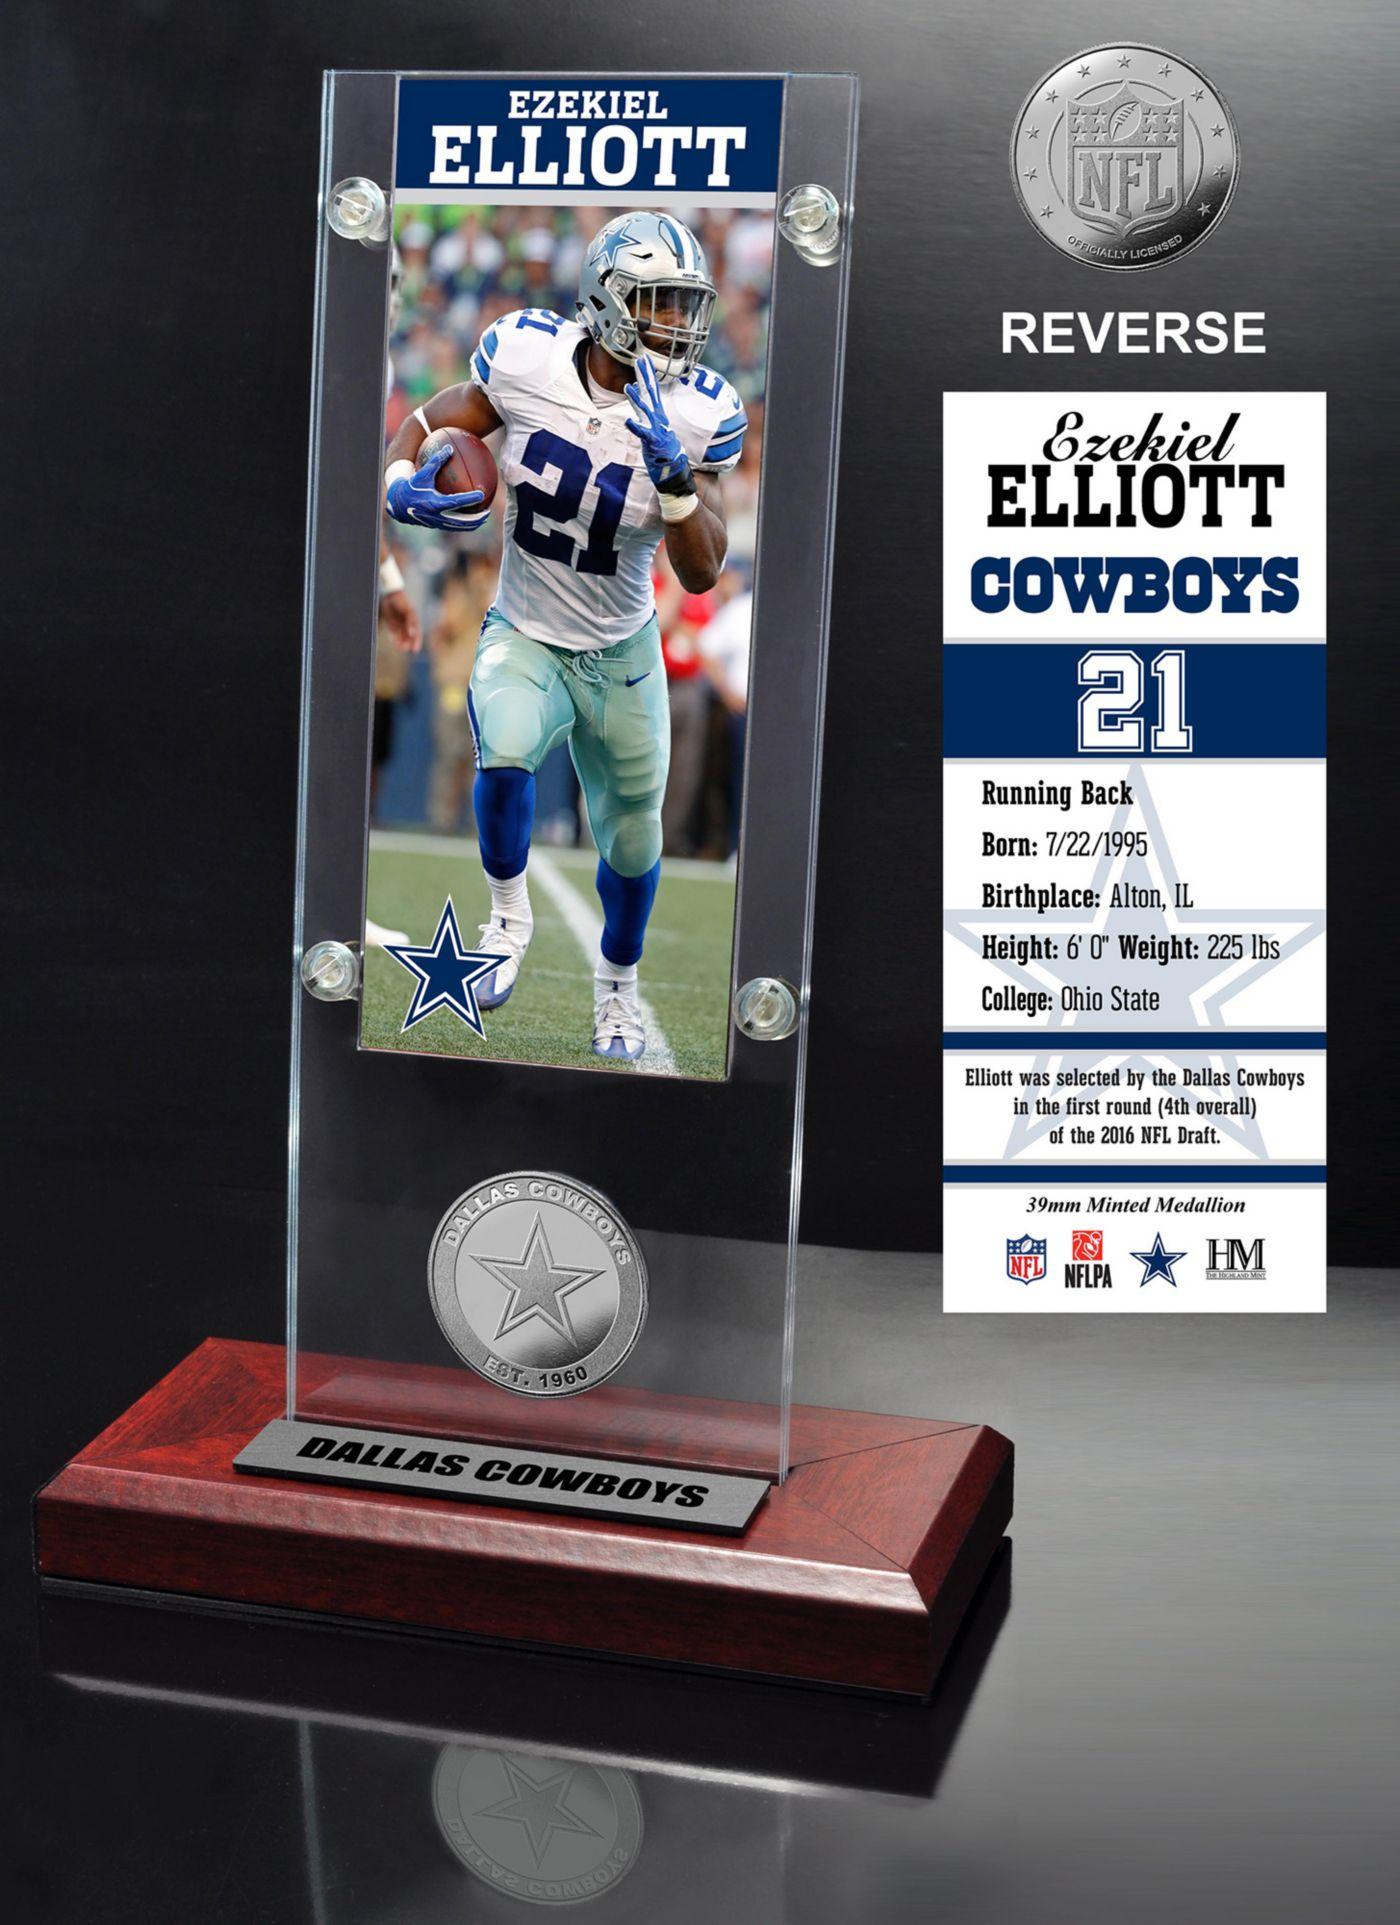 Highland Mint Dallas Cowboys Ezekiel Elliott Ticket and Bronze Coin Desktop Display